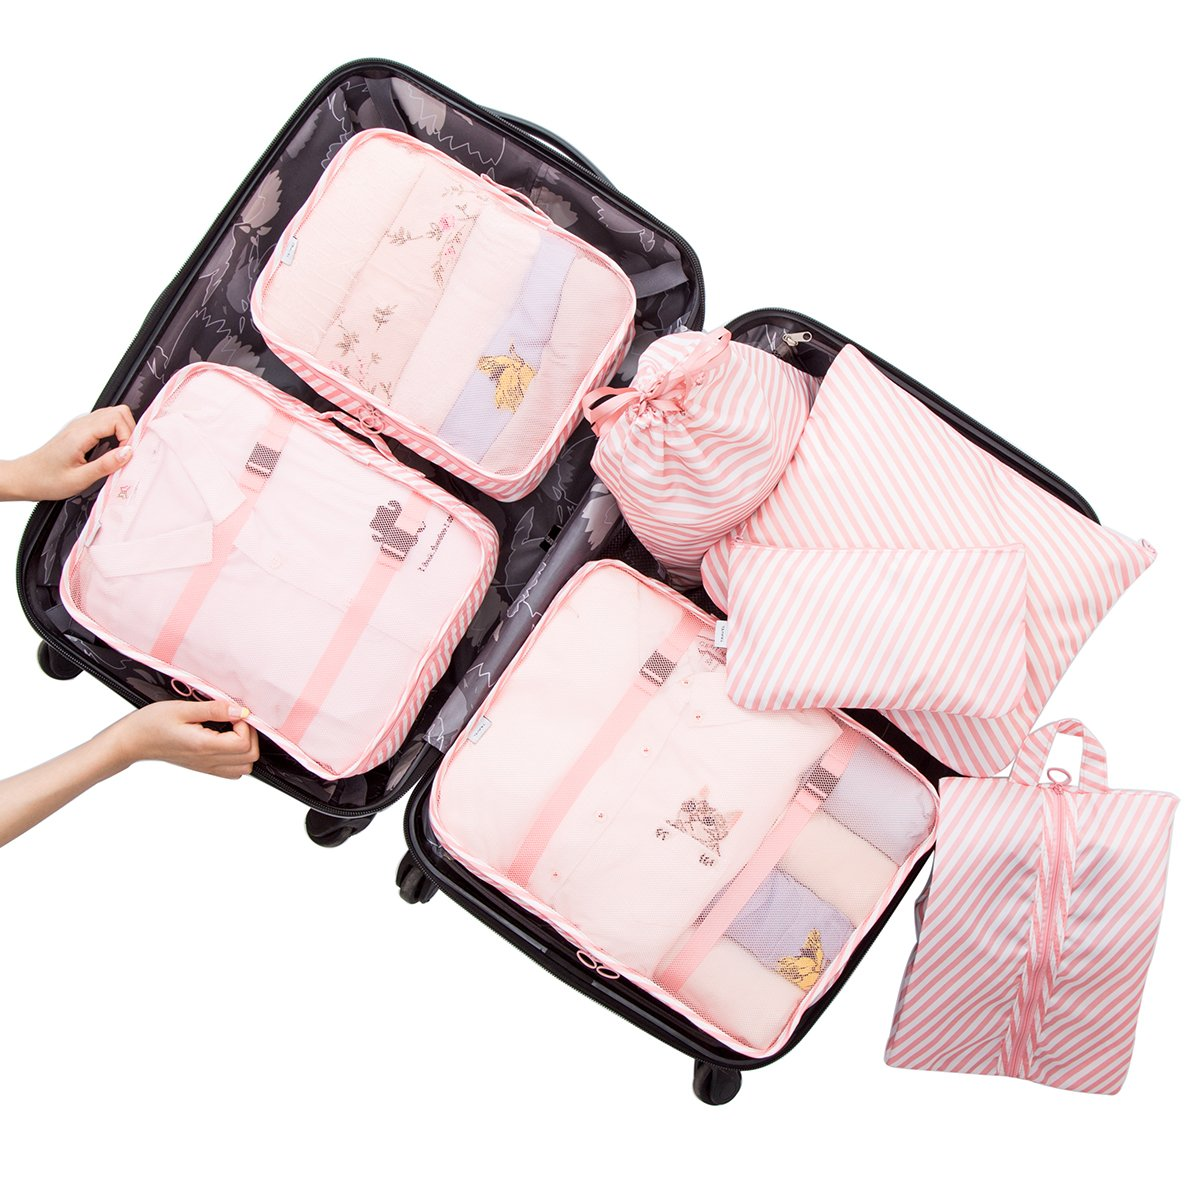 Belsmi 7 Set Packing Cubes With Shoe Bag - Compression Travel Luggage Organizer (Pink Stripes)